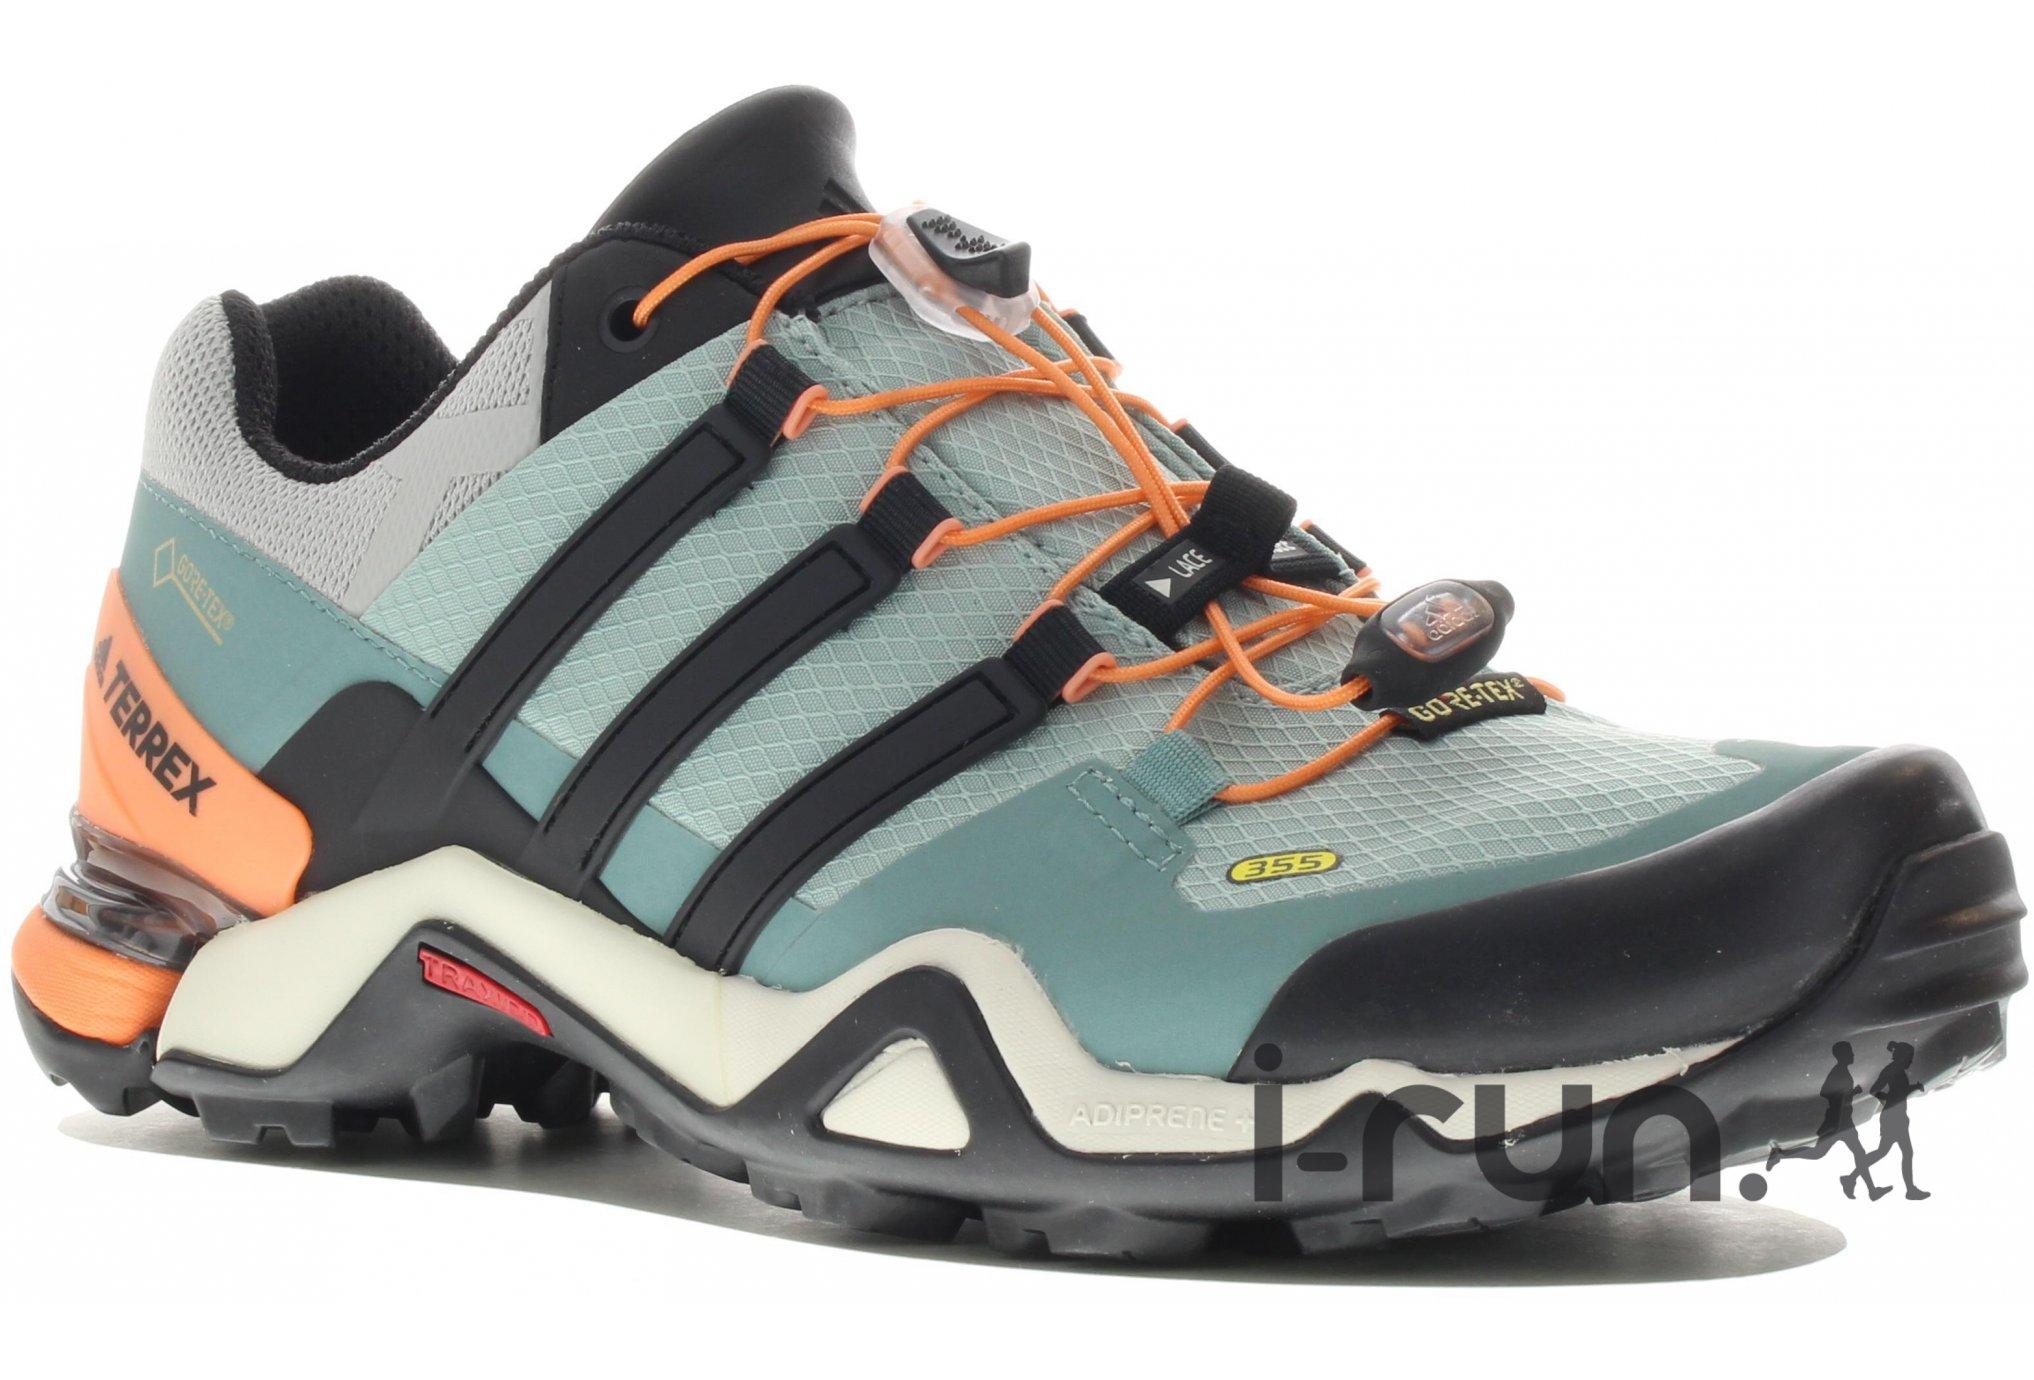 Running Femme R W Trail Adidas Chaussures Session Gore Fast Terrex Tex zpVSMqULG